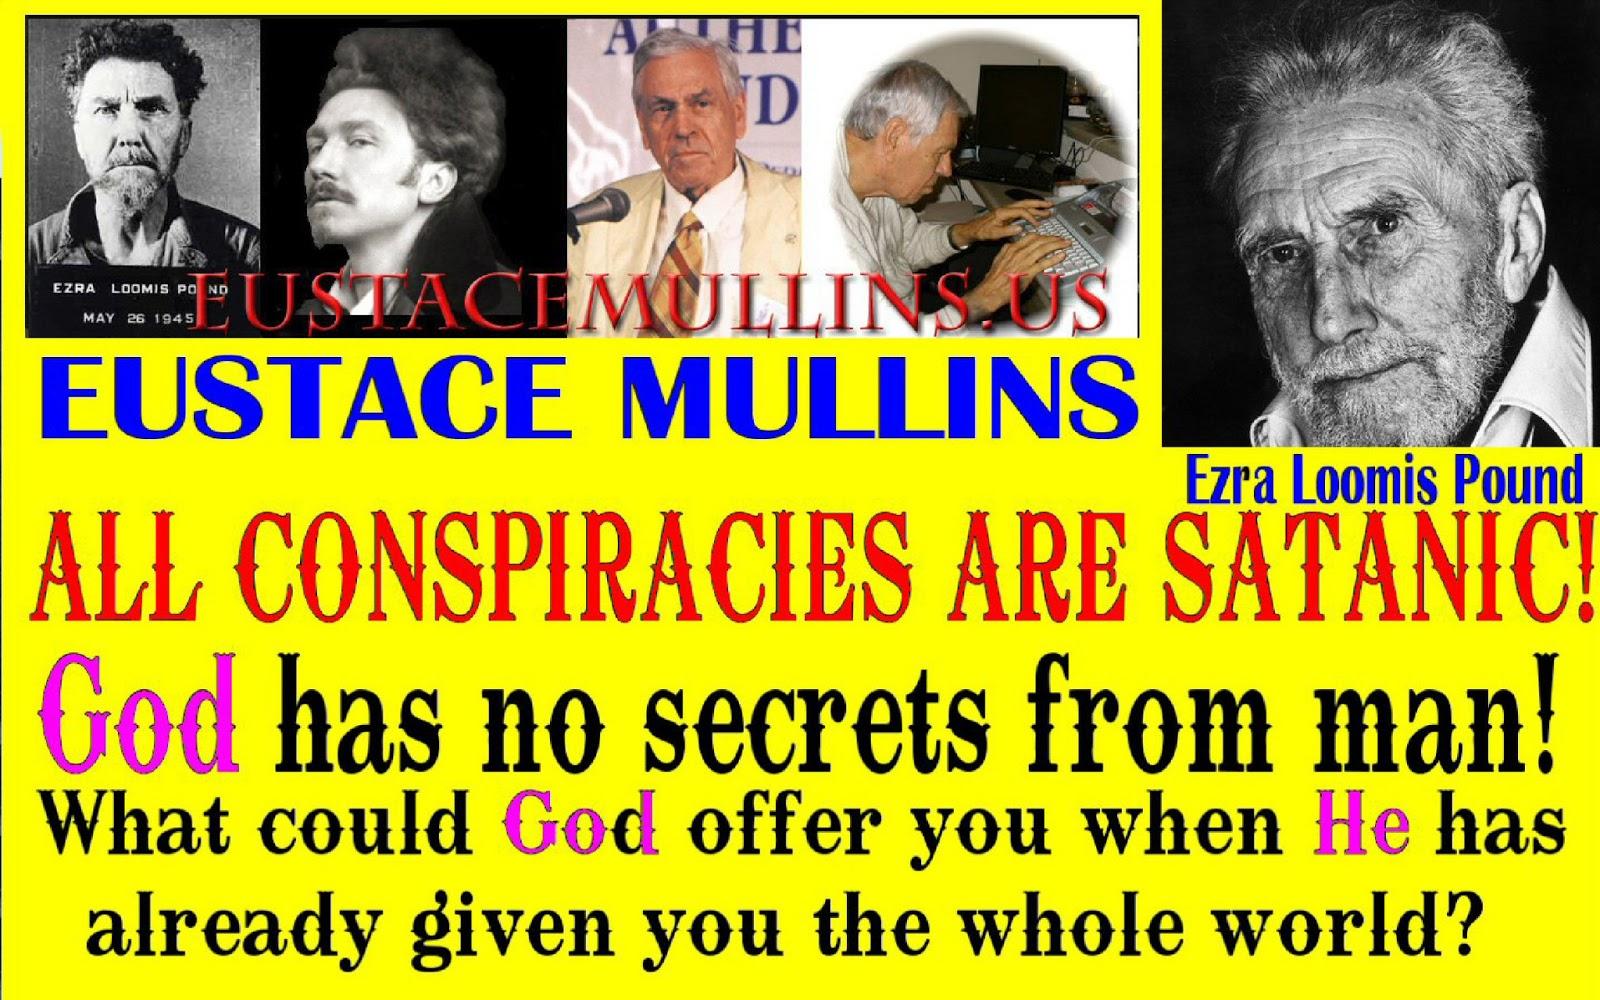 Eustace Mullins, Curse of Canaan